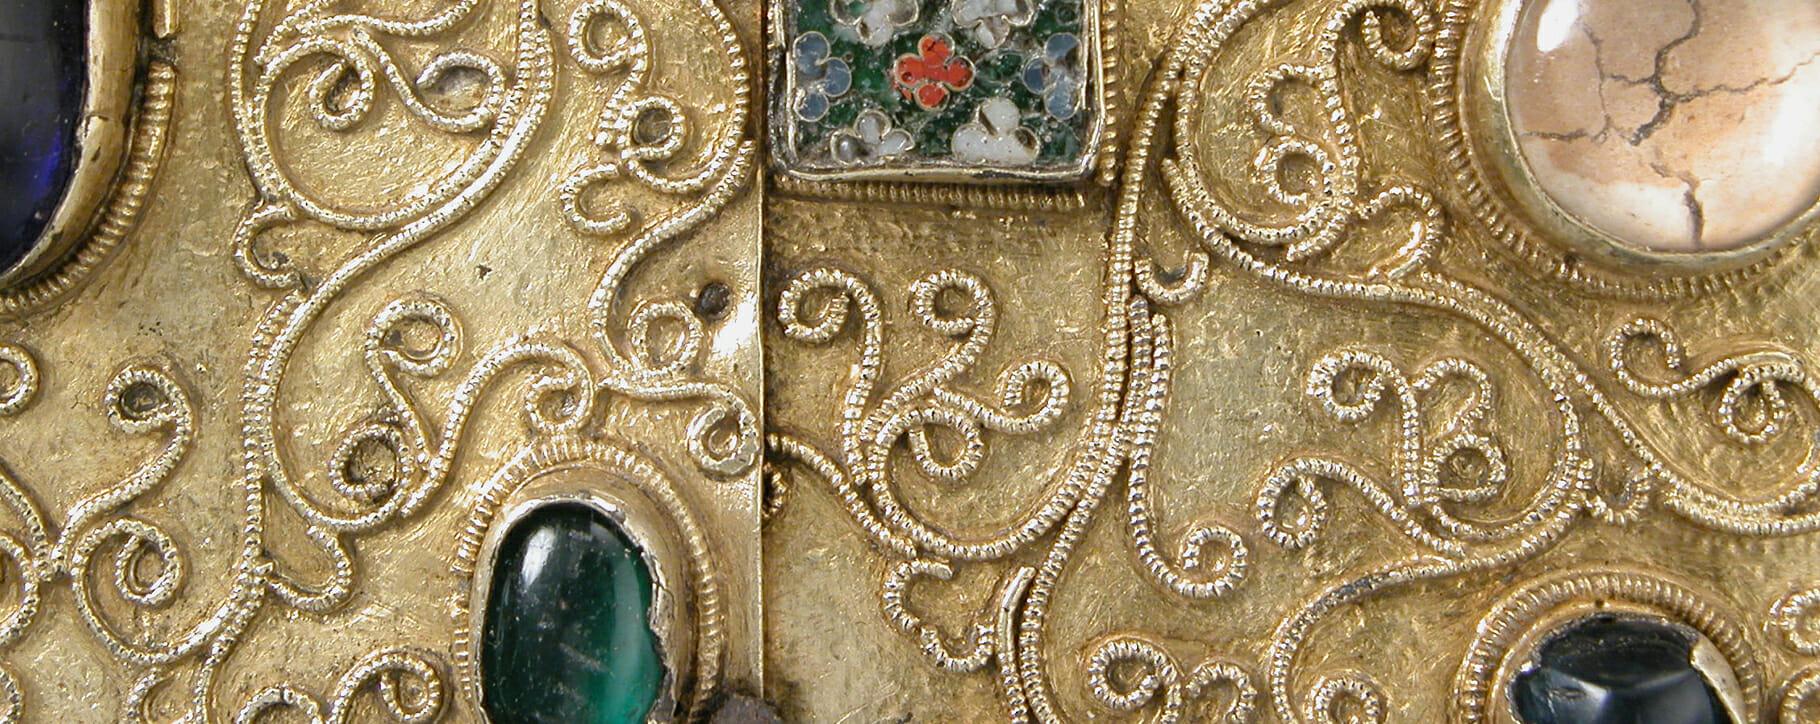 Metal Jewel Detail